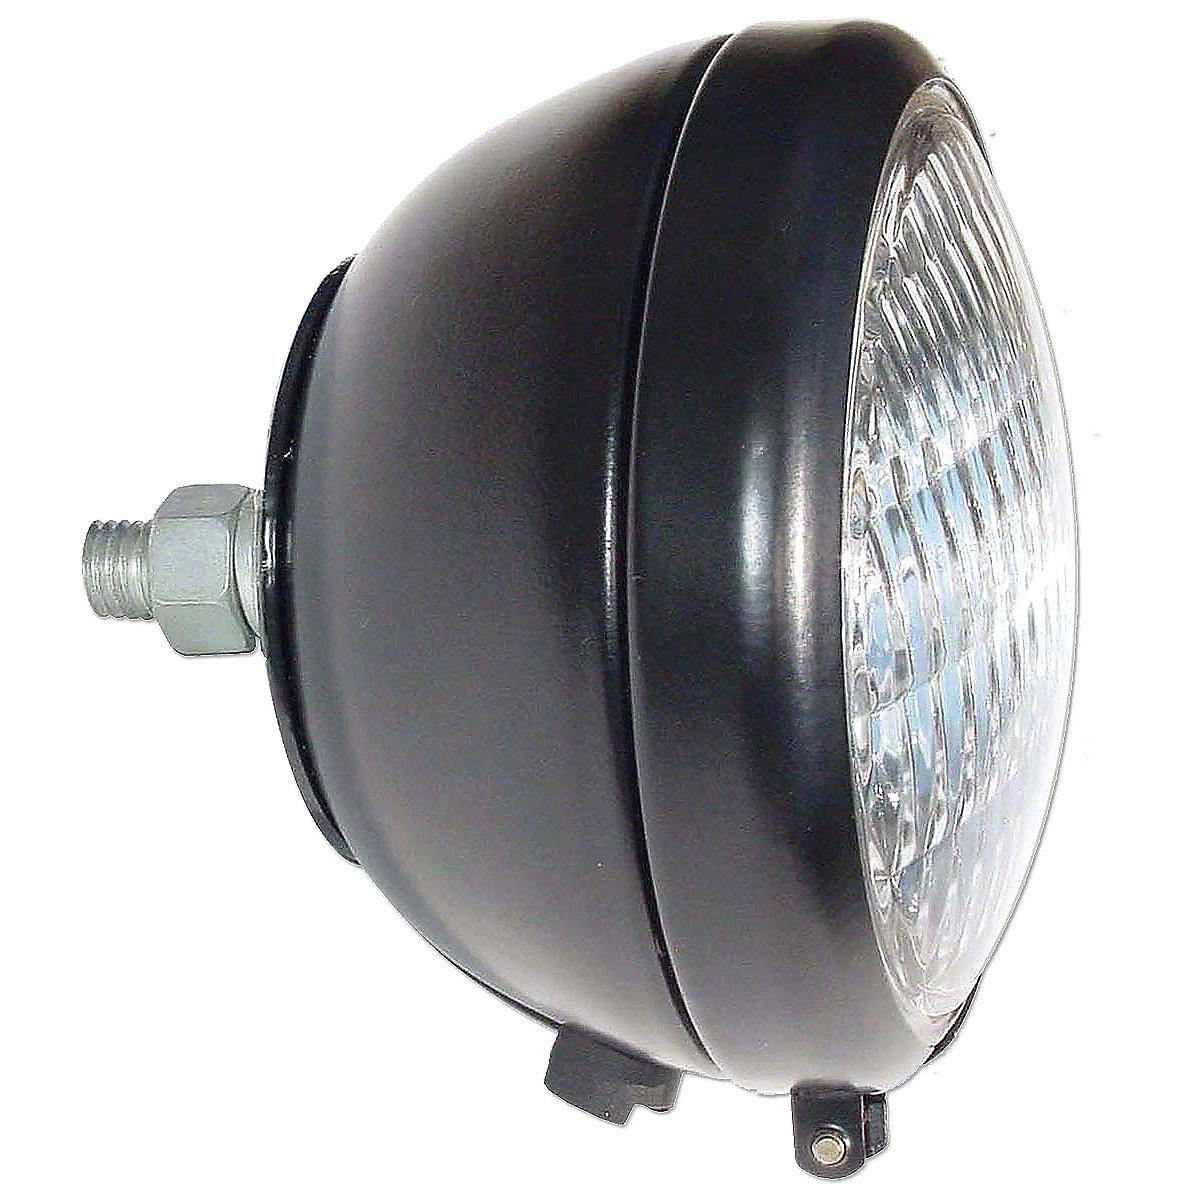 12 Volt Headlight Assembly For Allis Chalmers: 190XT, 170, 175, 180, 185, 190, 200.